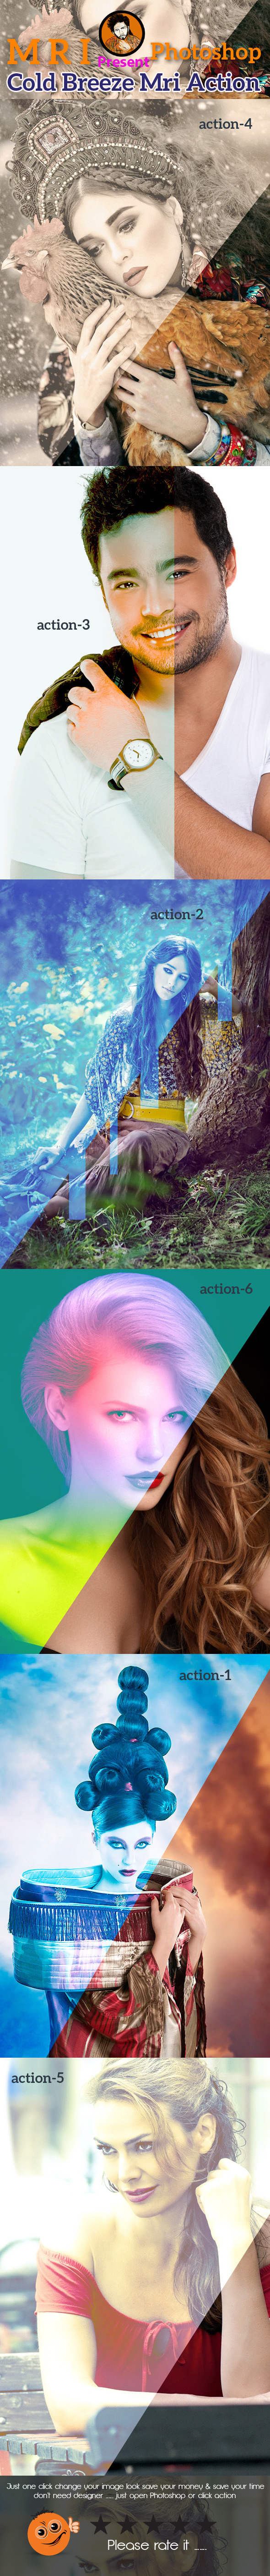 Cold Breeze Mri Action - Actions Photoshop